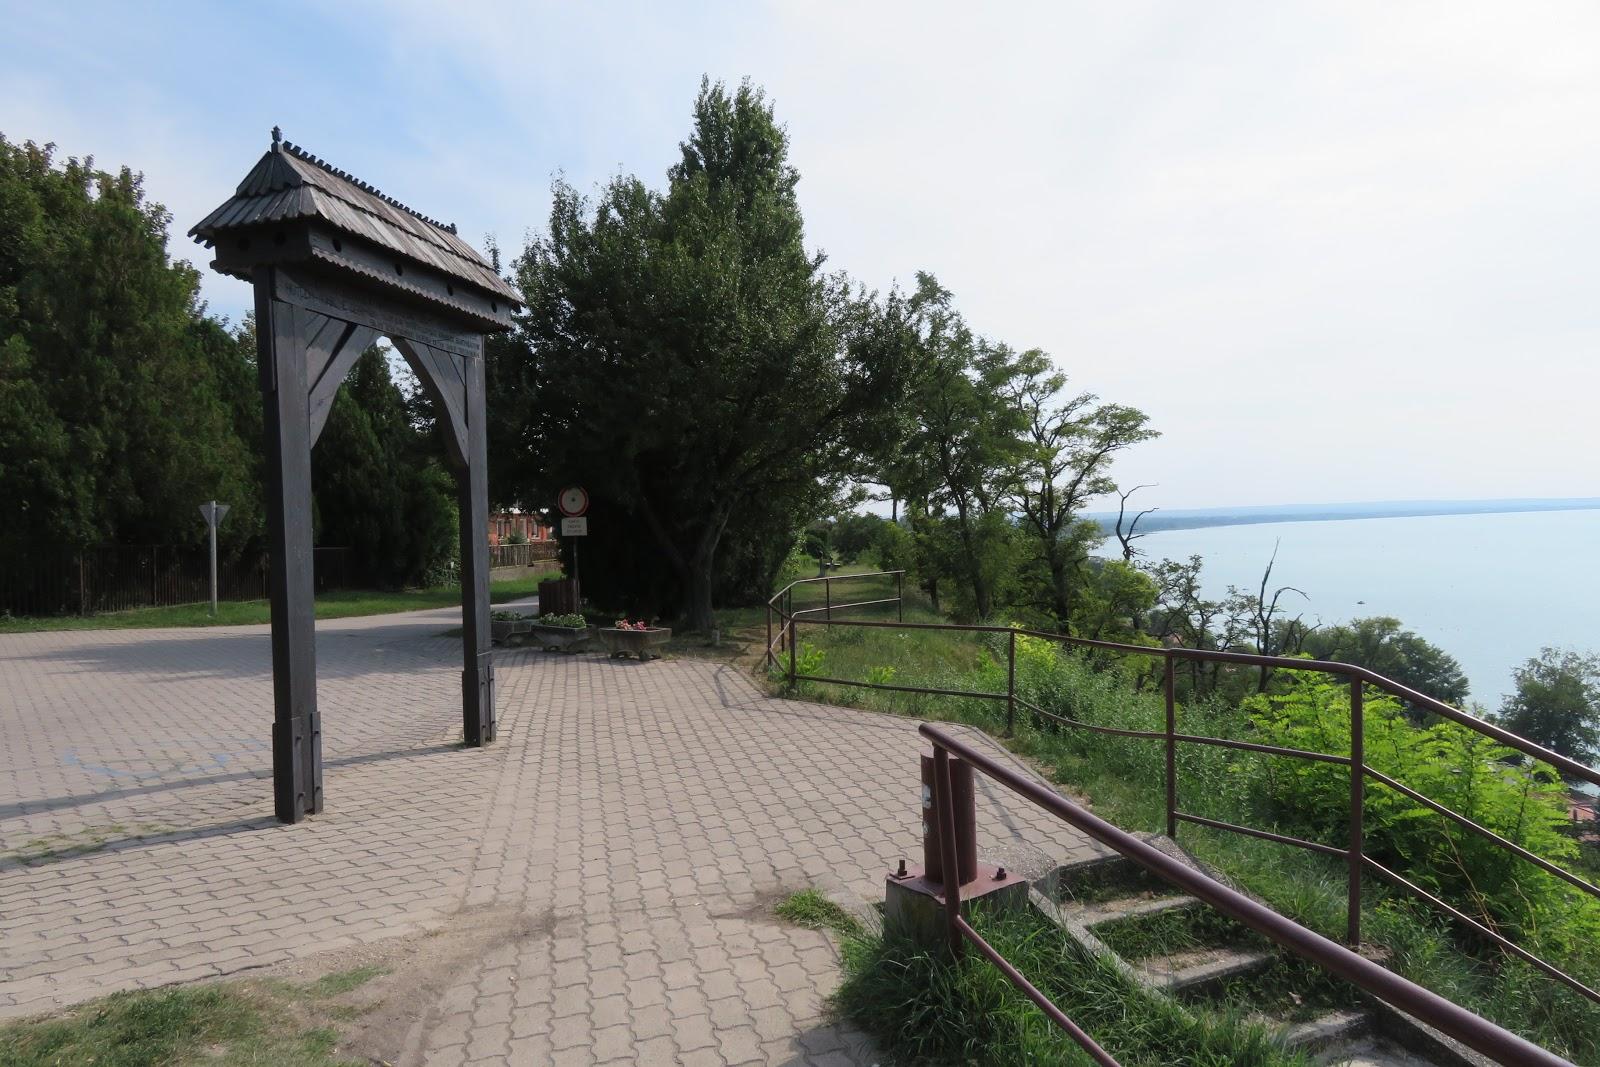 Magyar Kaland Balatonvilagos Panorama Kilato